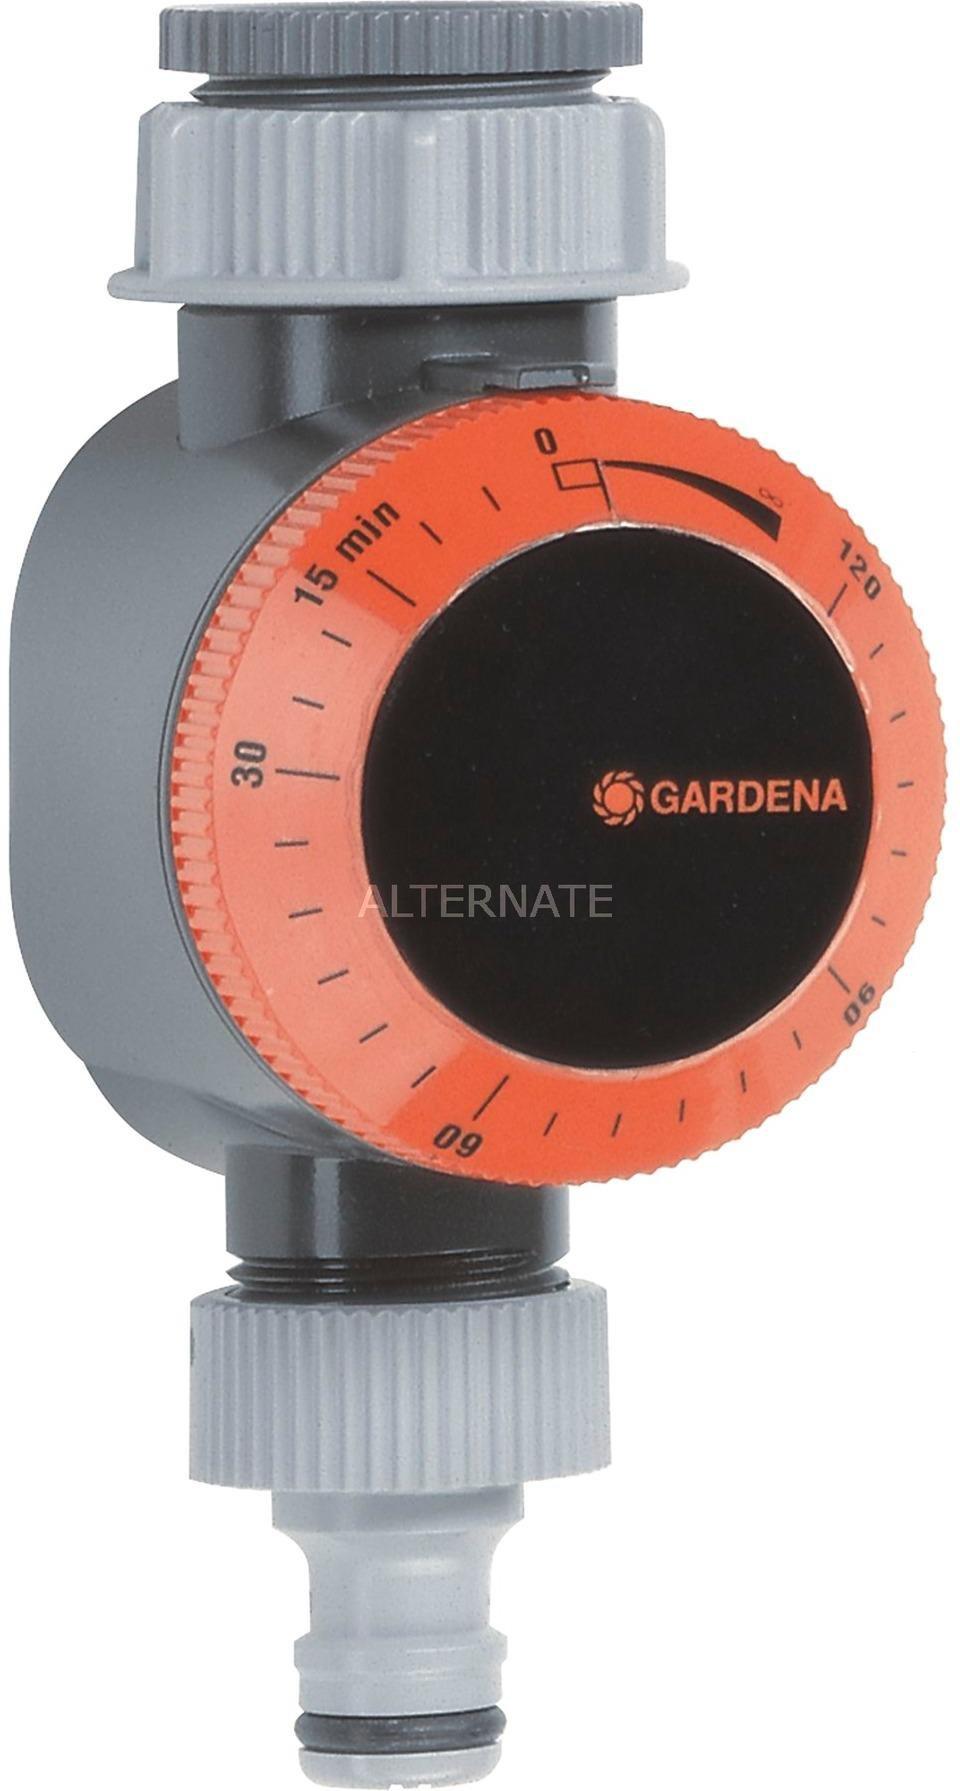 Gardena Bewässerungsuhr 1169-20 Bewässerung Uhr Timer Garten Wasseruhr